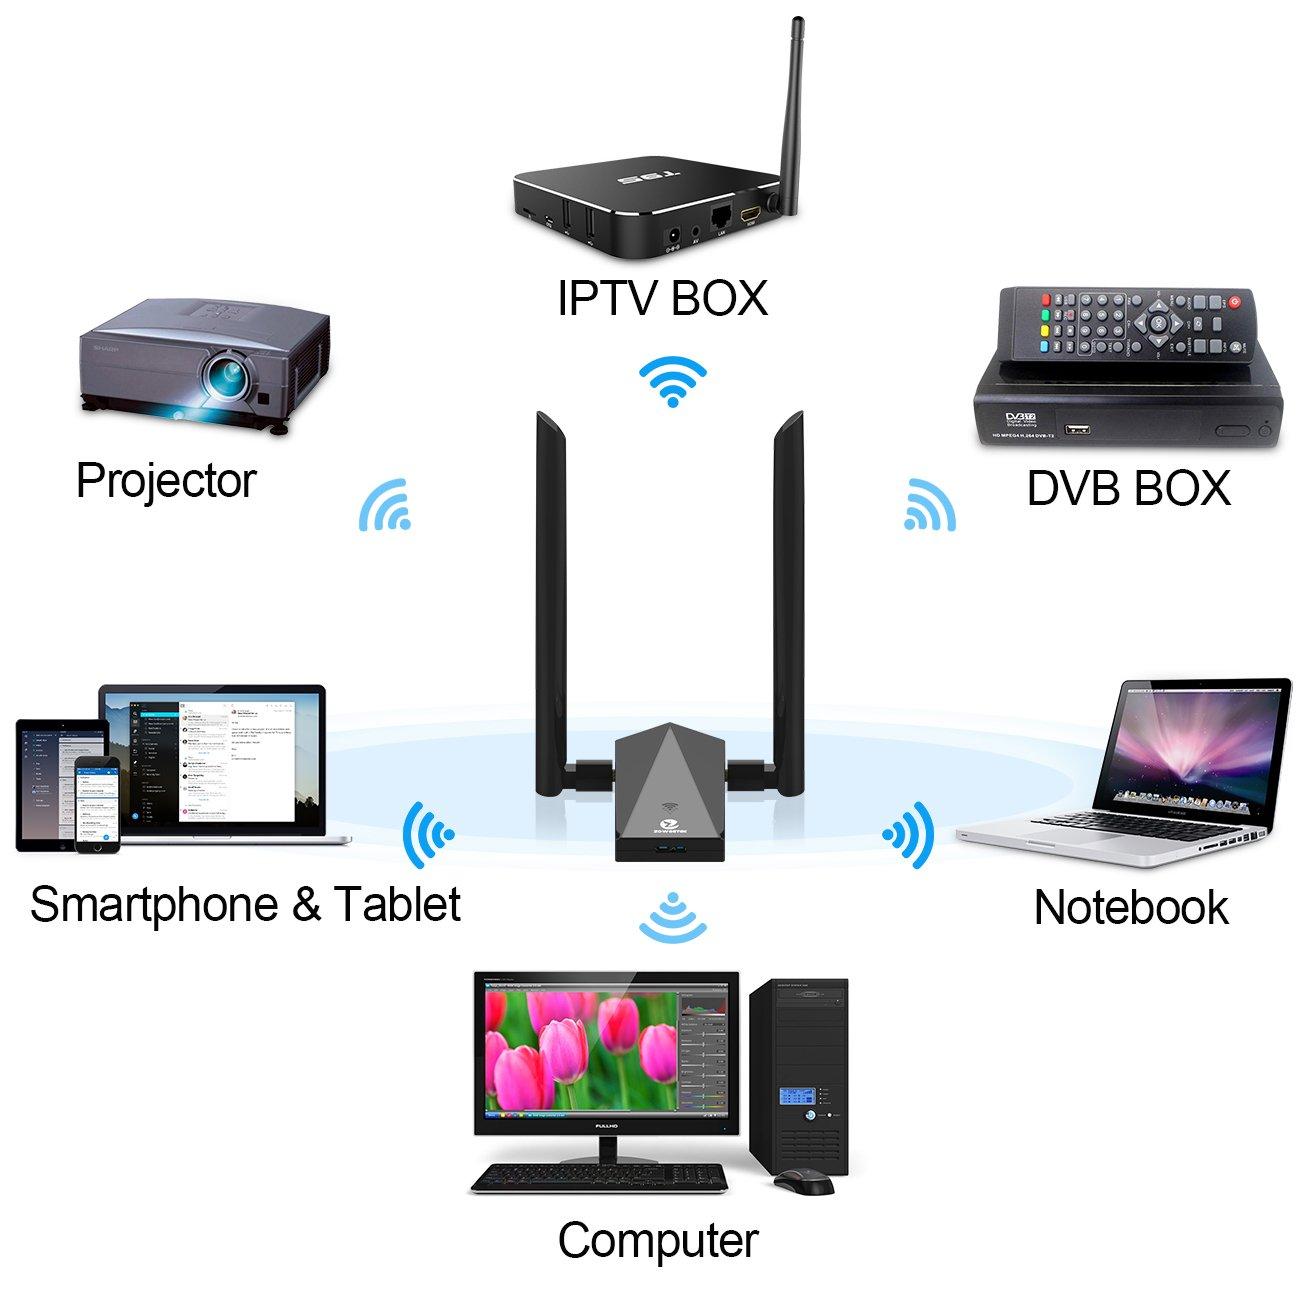 Zoweetek Wi-Fi Adapter AC 1200Mbps USB 3.0 Dual Band (5.8G /2.4G) Long Range Network Adapter, Built-in Intelligence Antenna High Speed Transmission For Mac OS X 10.6-10.12 / Windows XP / Vista / 7 / 8 / 8.1 / 10 etc